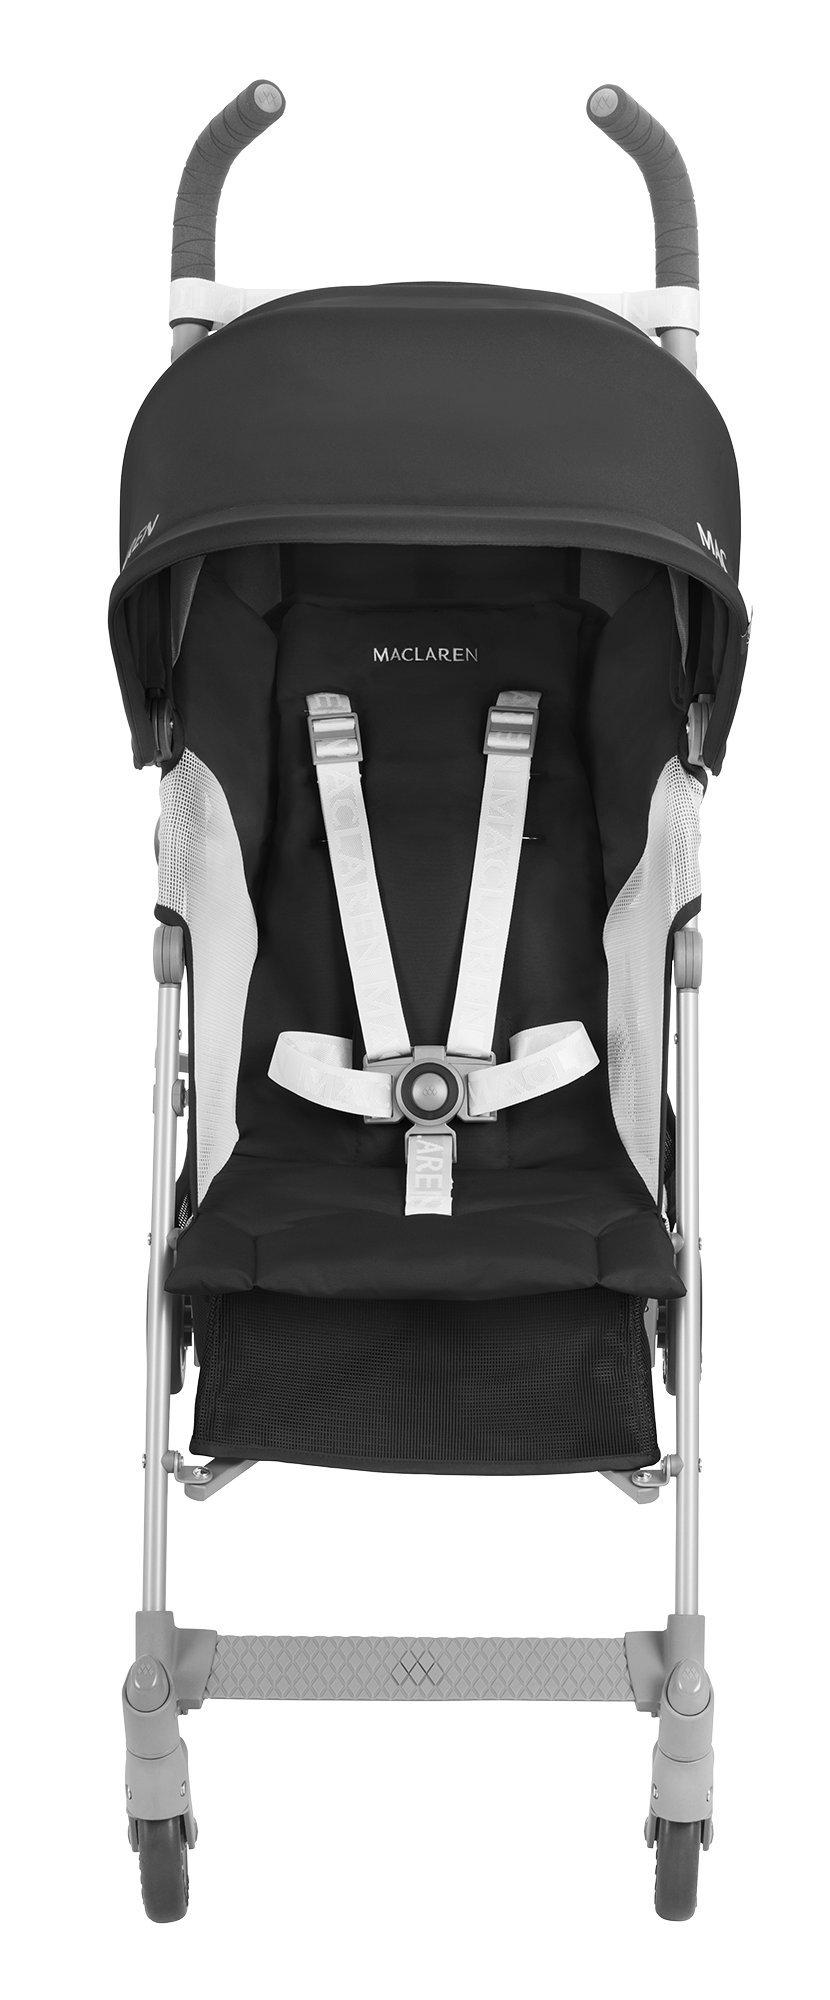 Maclaren Globetrotter Stroller - lightweight, compact by Maclaren (Image #4)